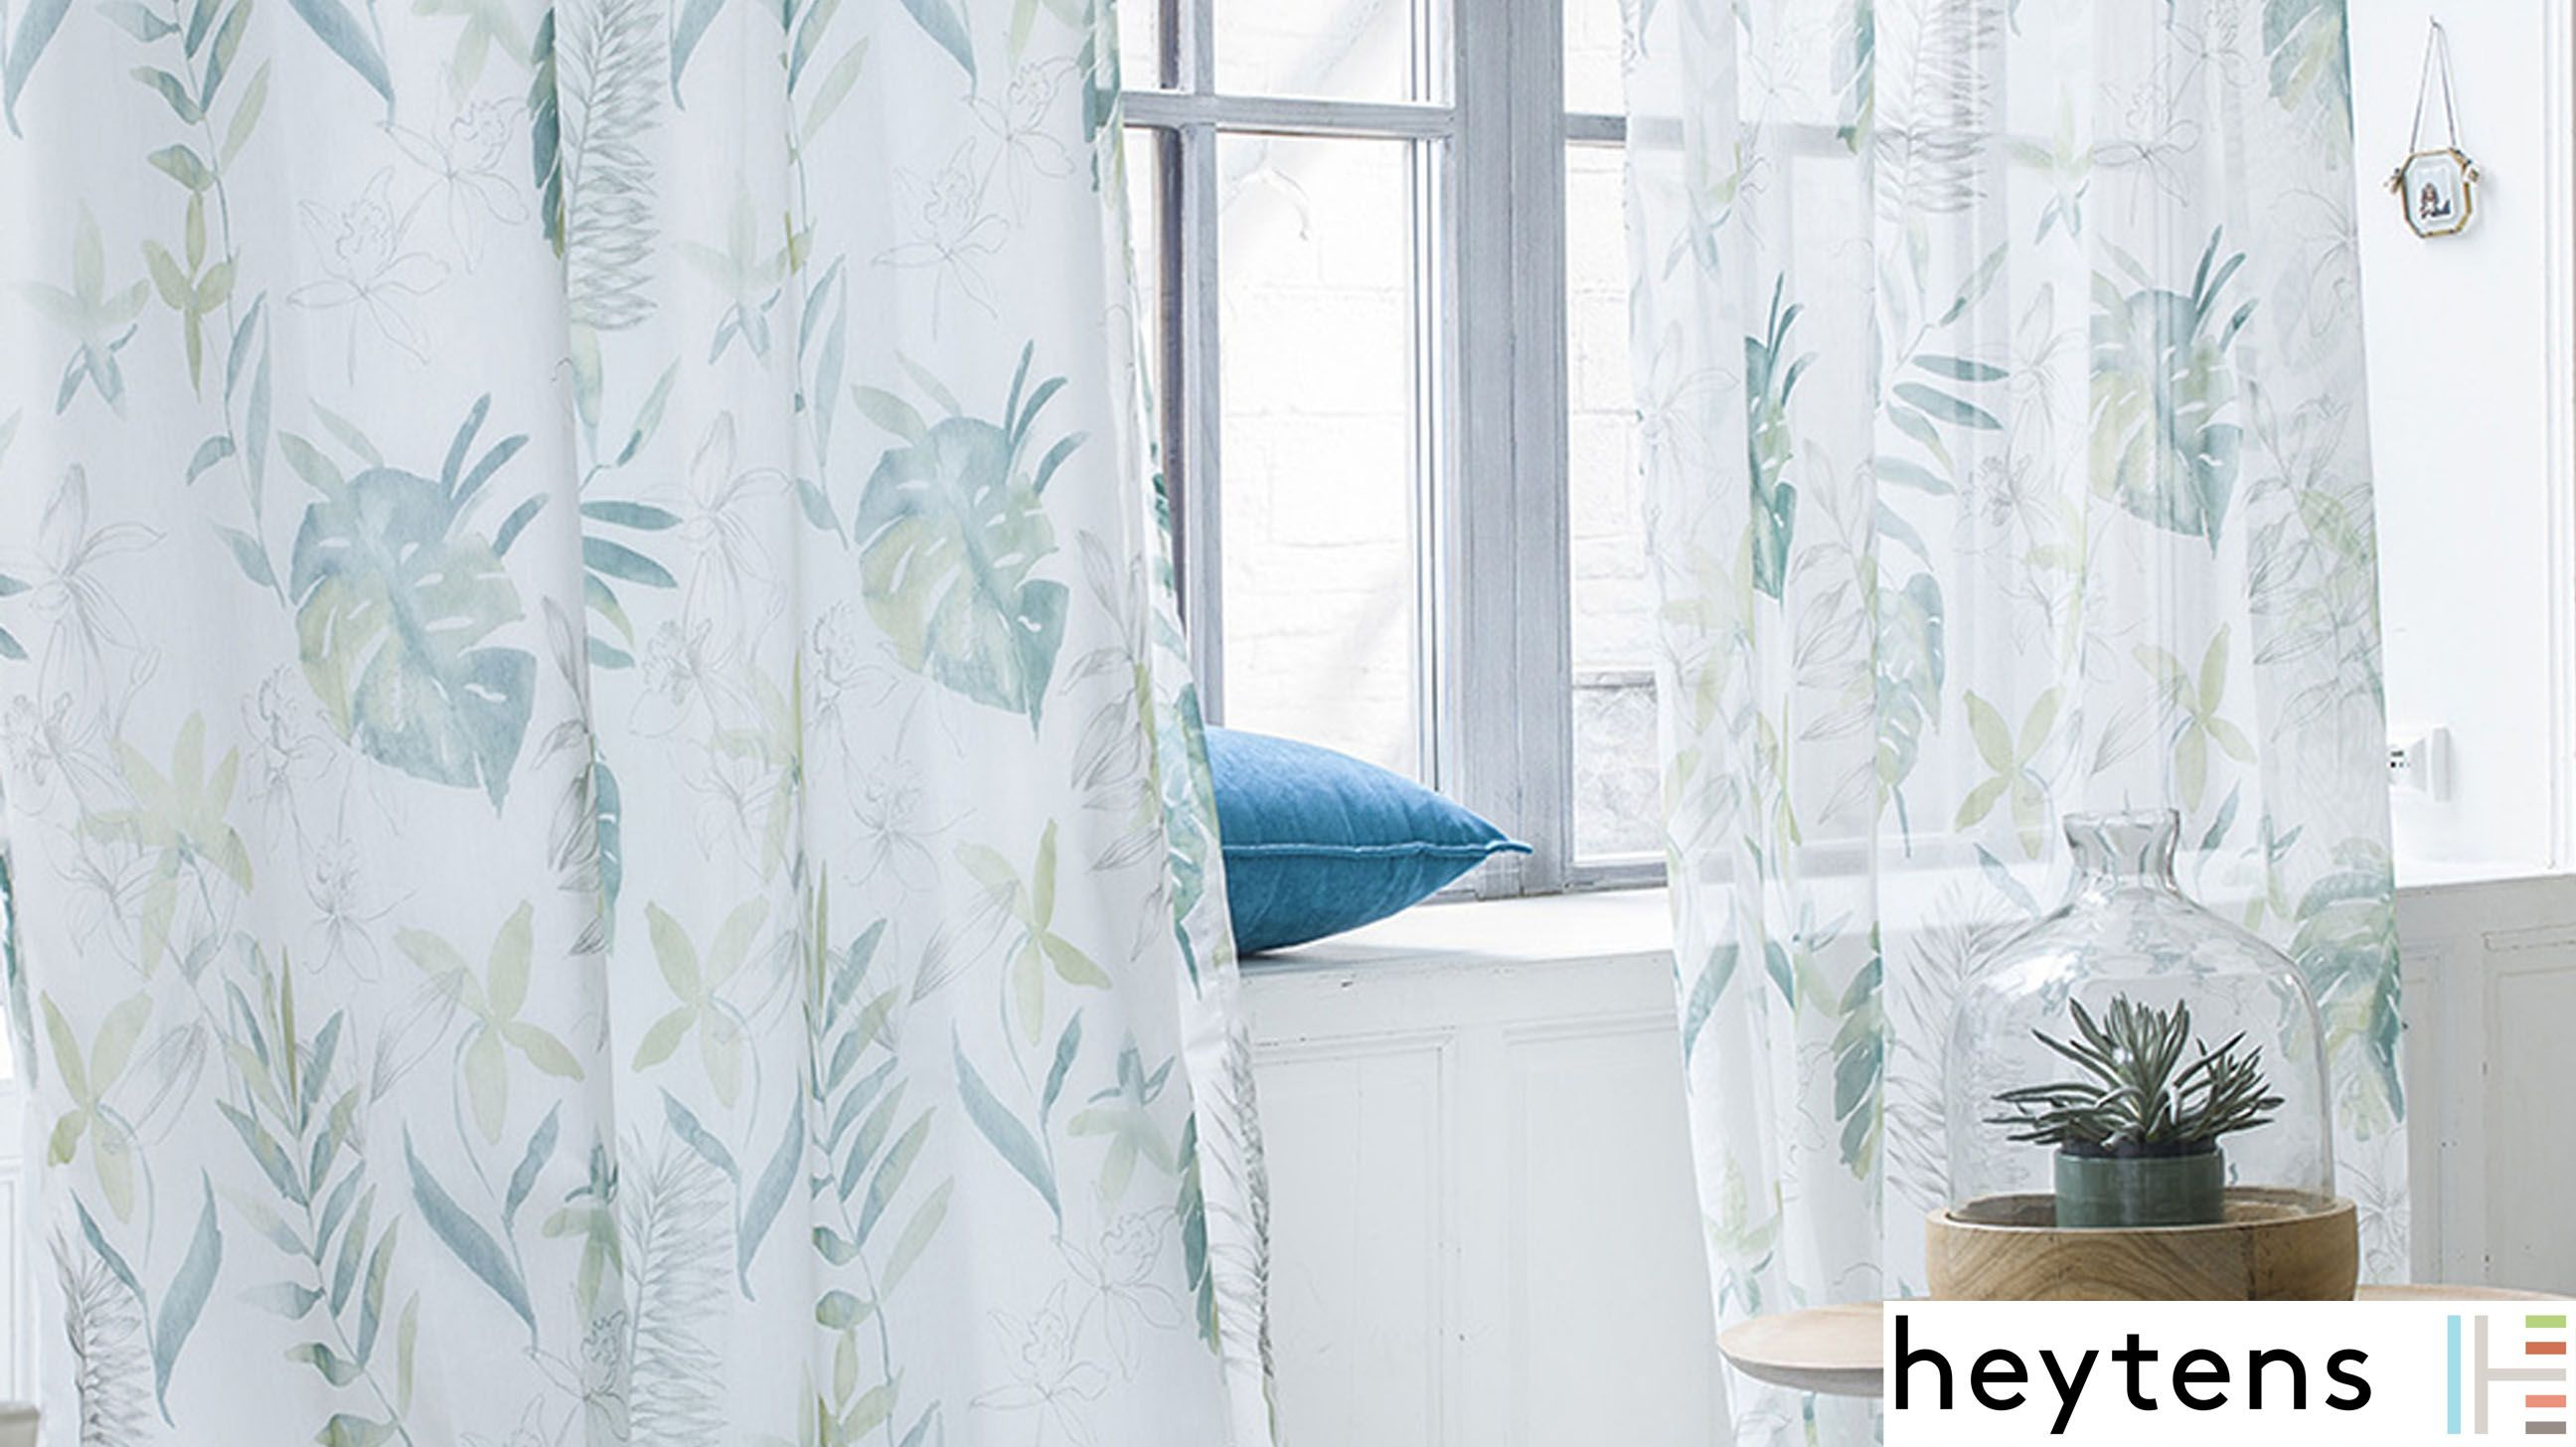 18++ Papier peint salle de bain heytens ideas in 2021